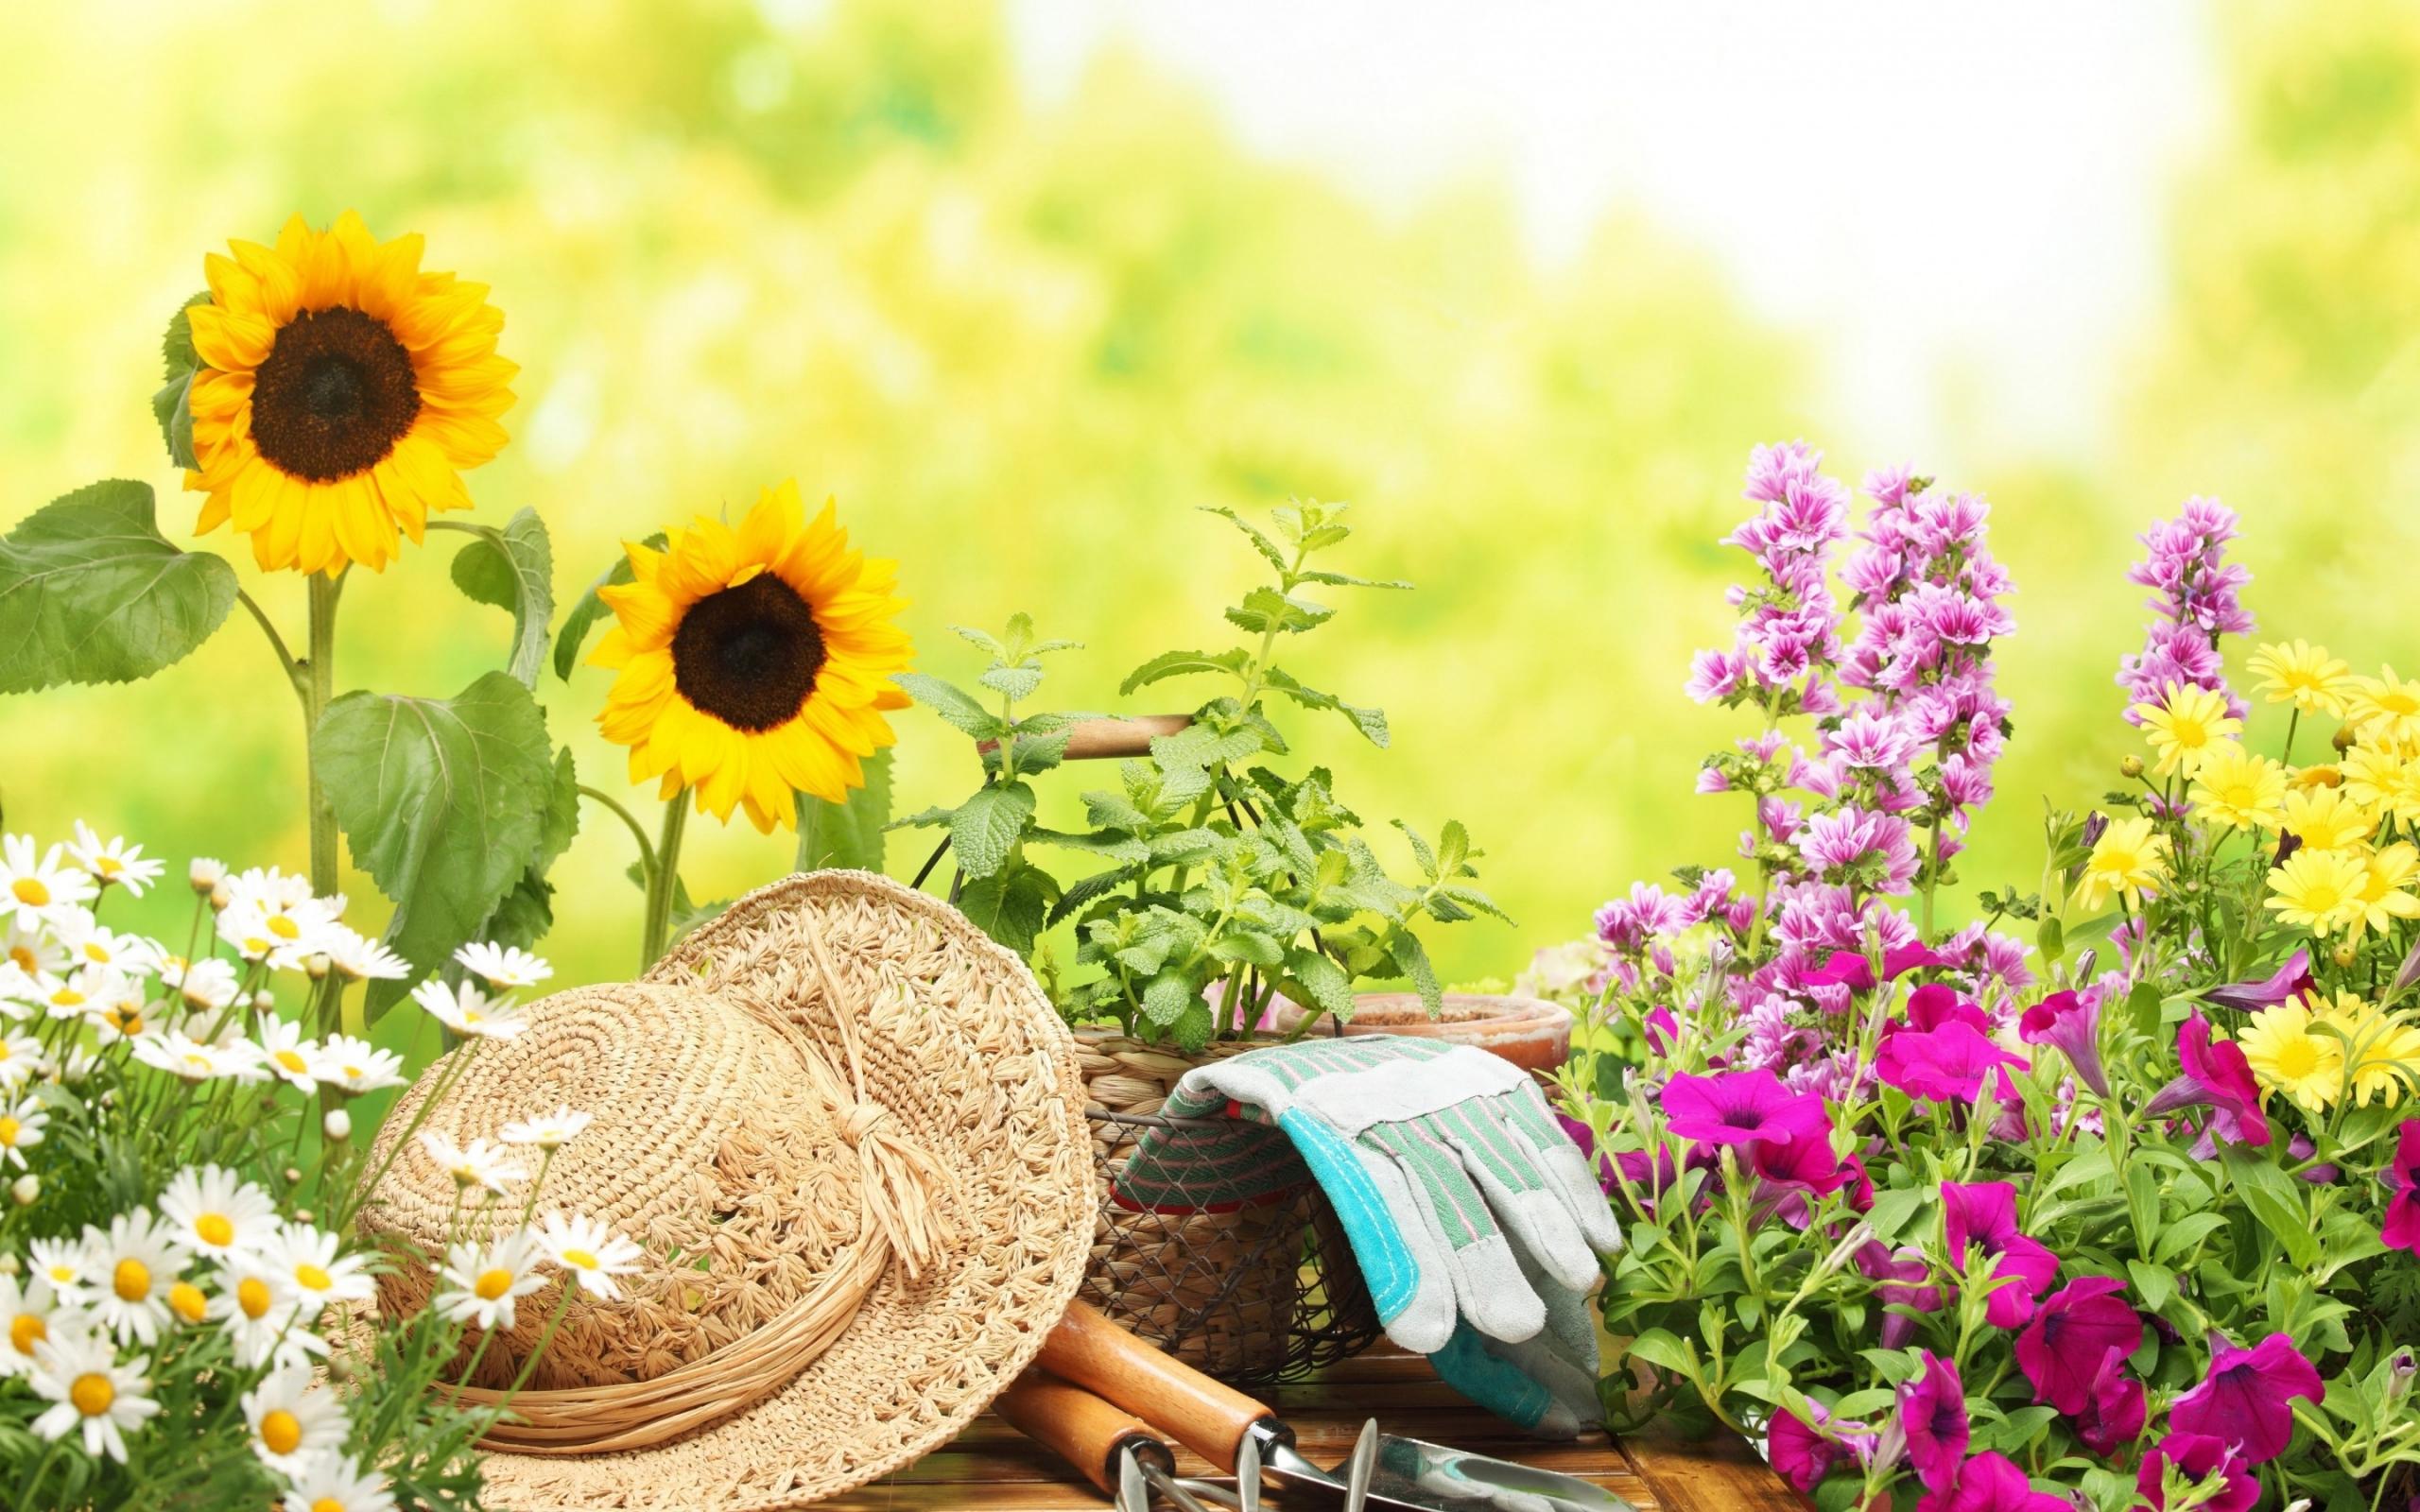 Garden Hd Wallpaper Background Image 2560x1600